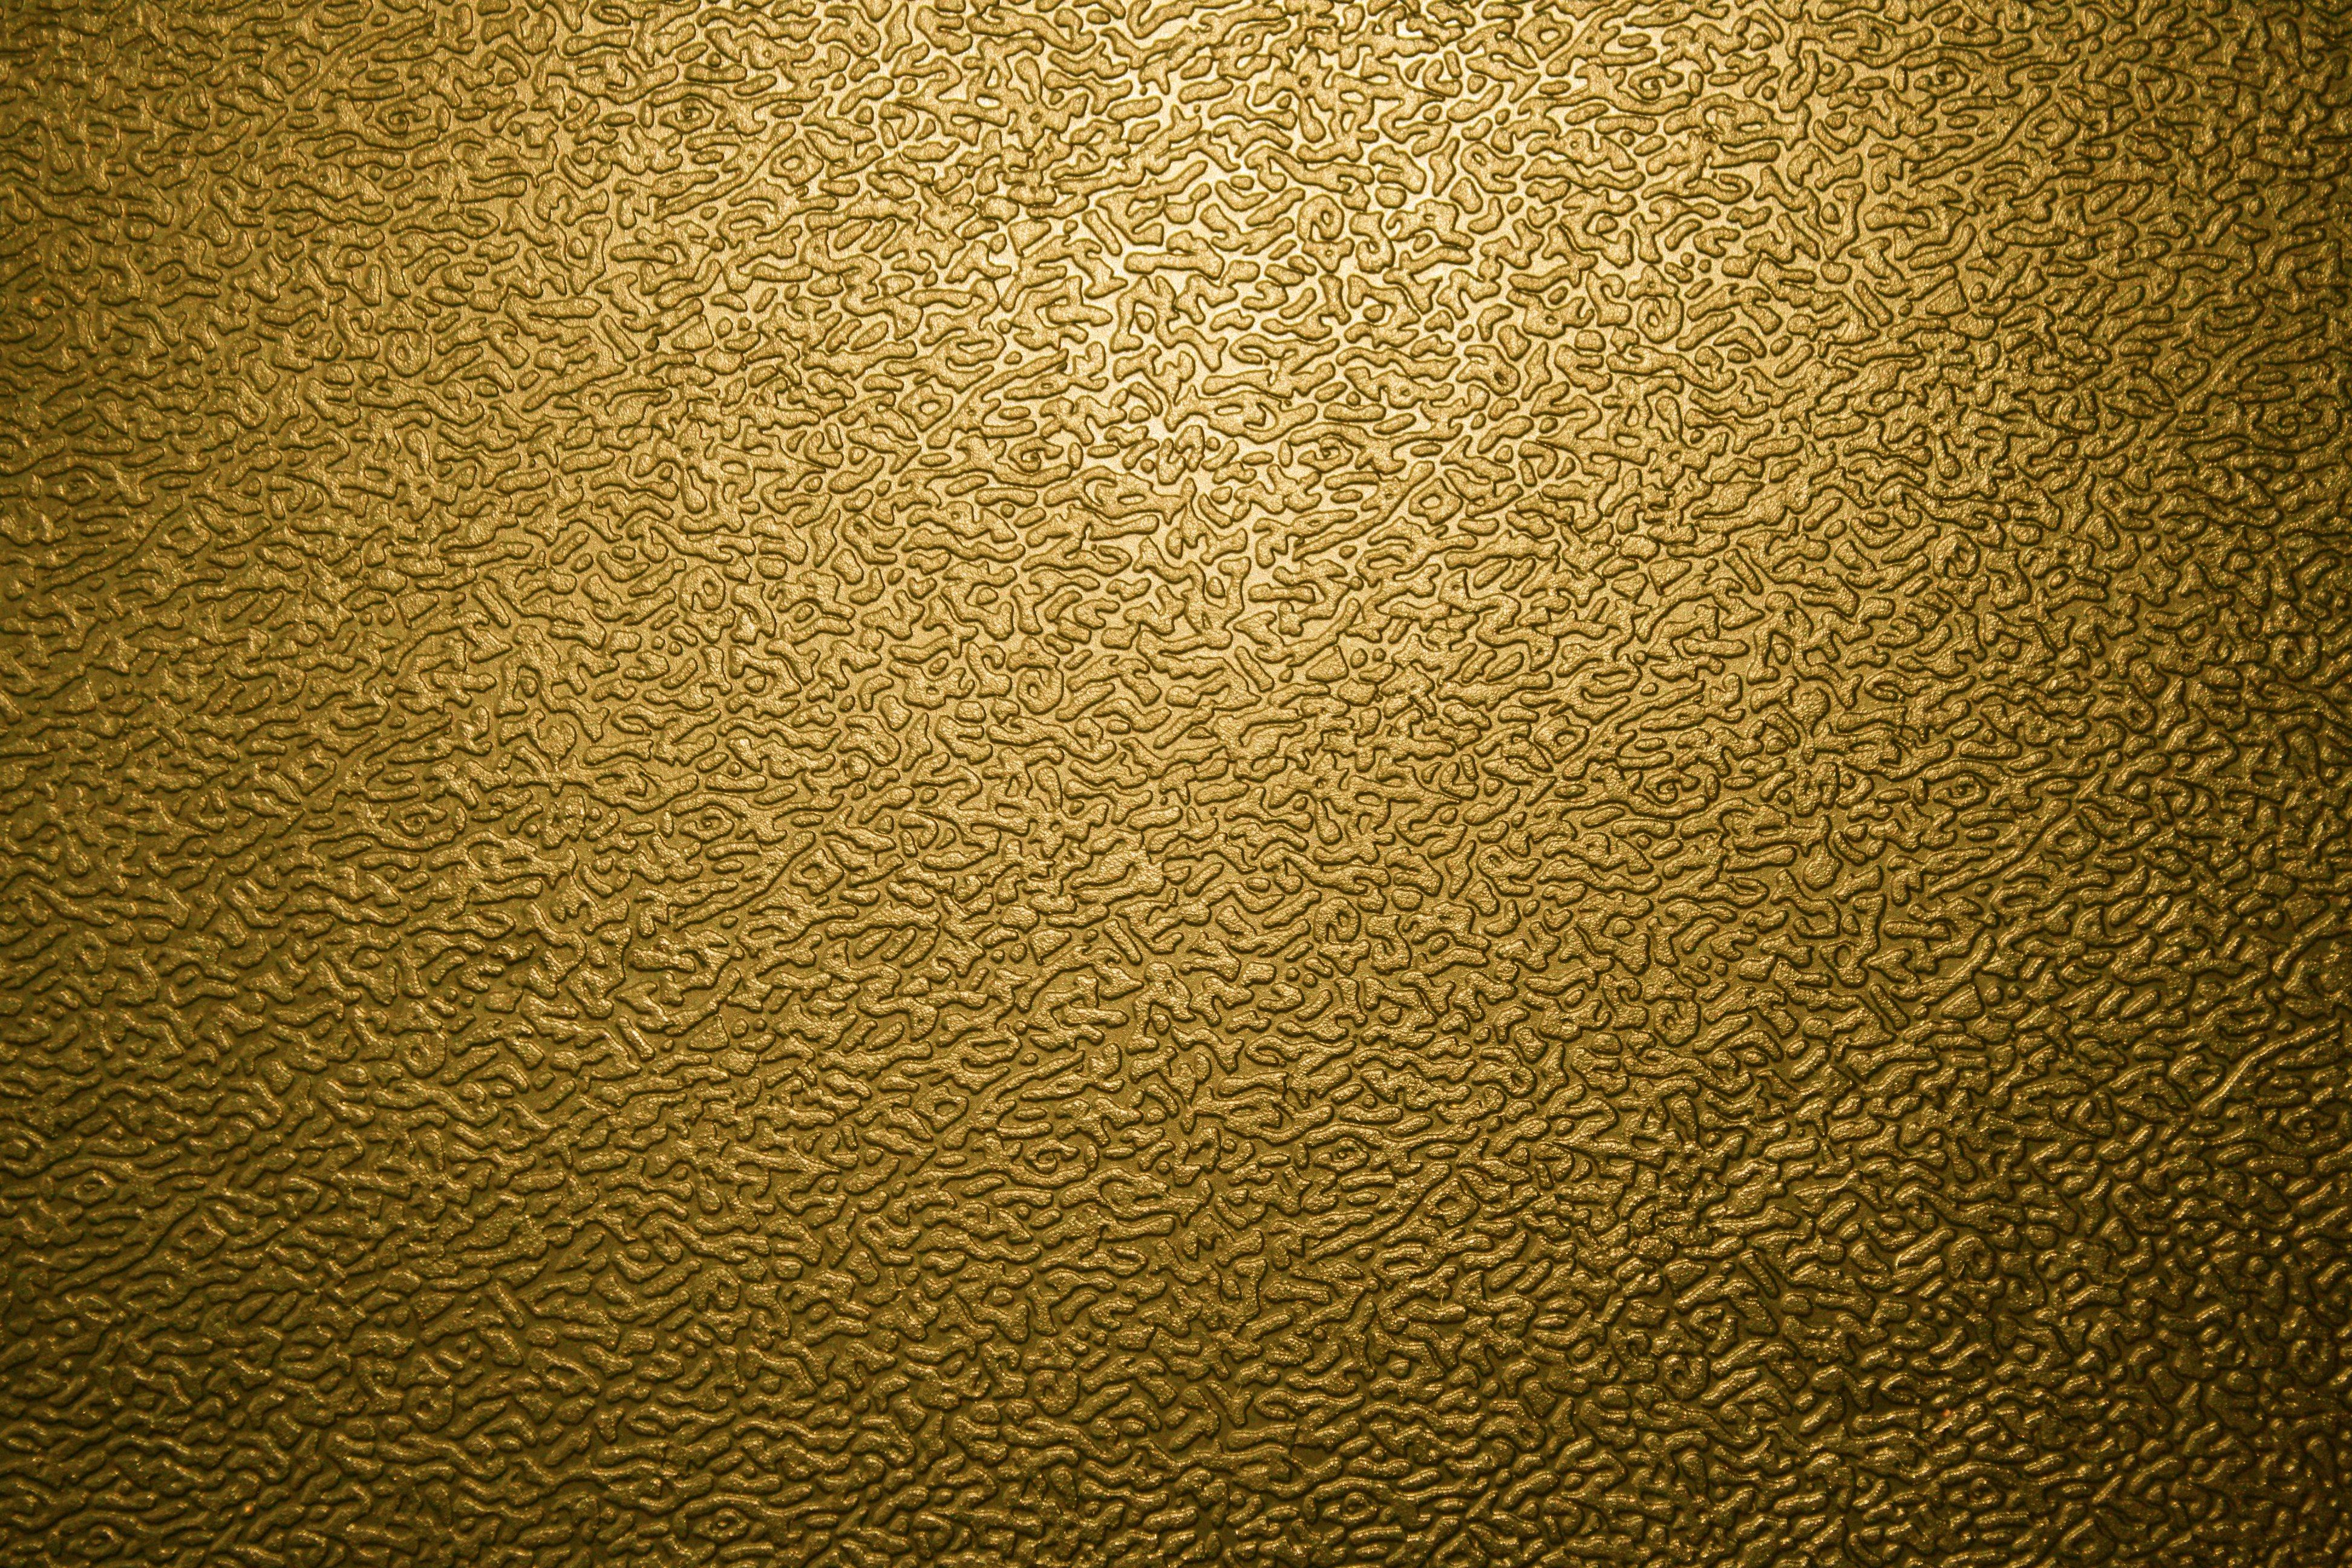 42 Gold Textured Wallpaper On Wallpapersafari